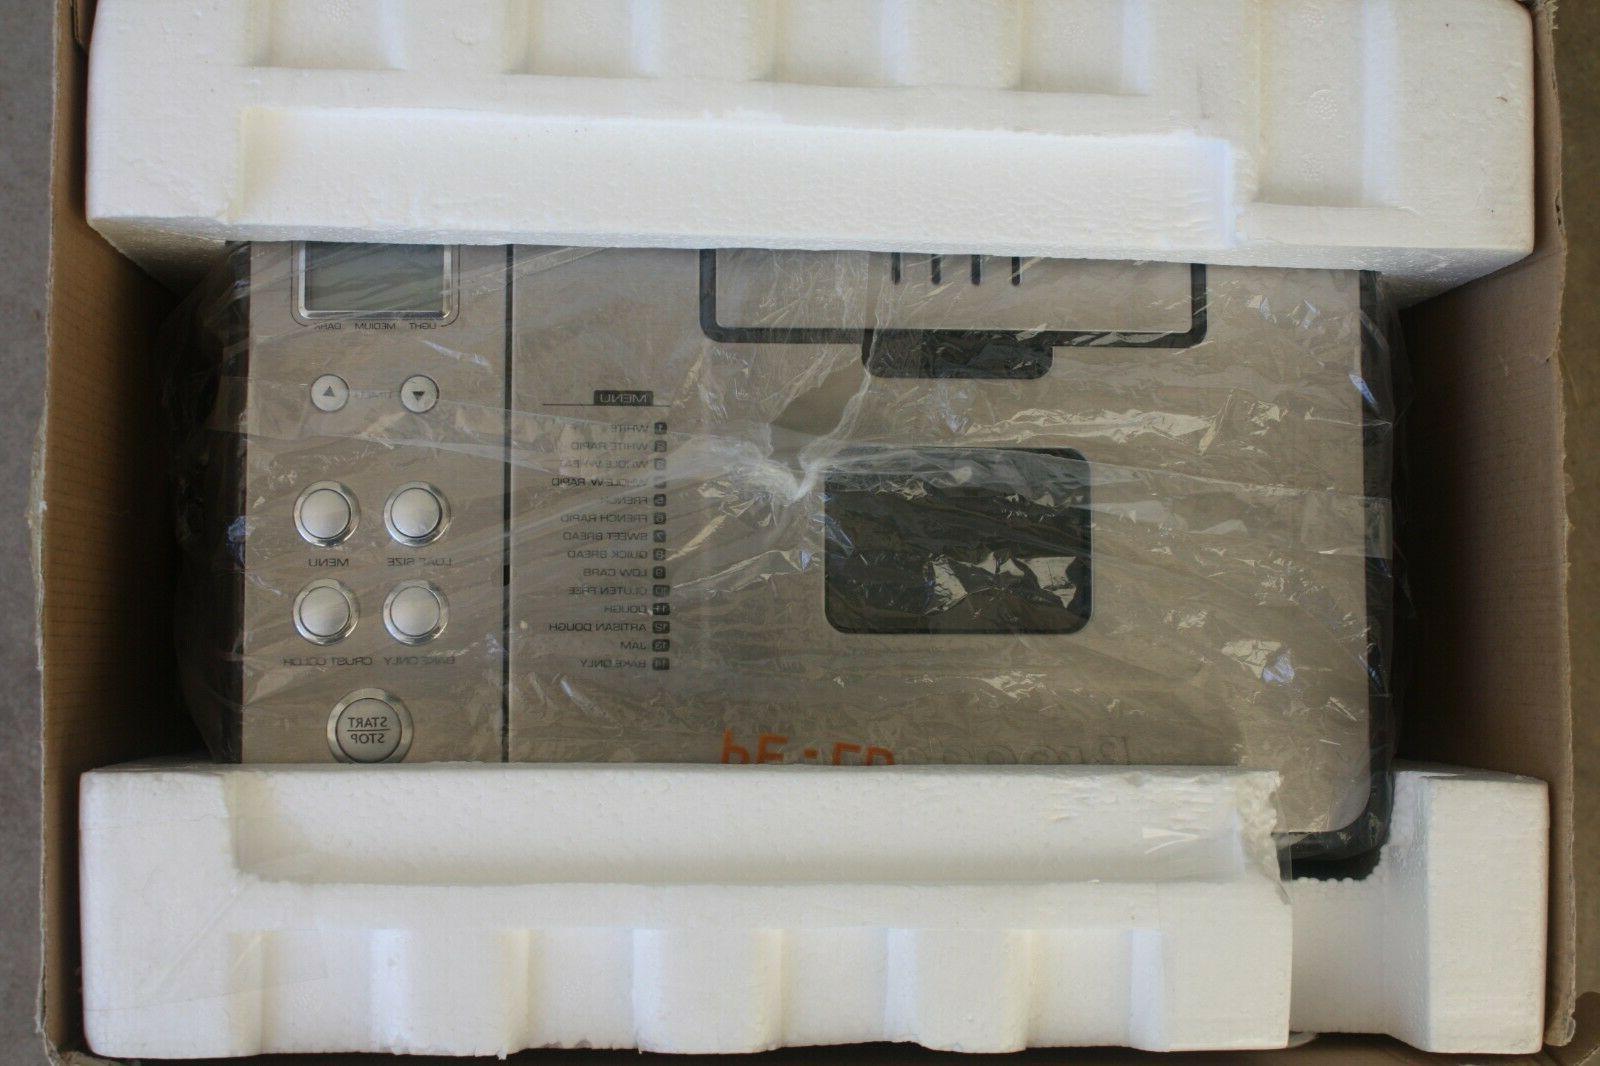 BREADMAN PROFESSIONAL BREAD MAKER MACHINE